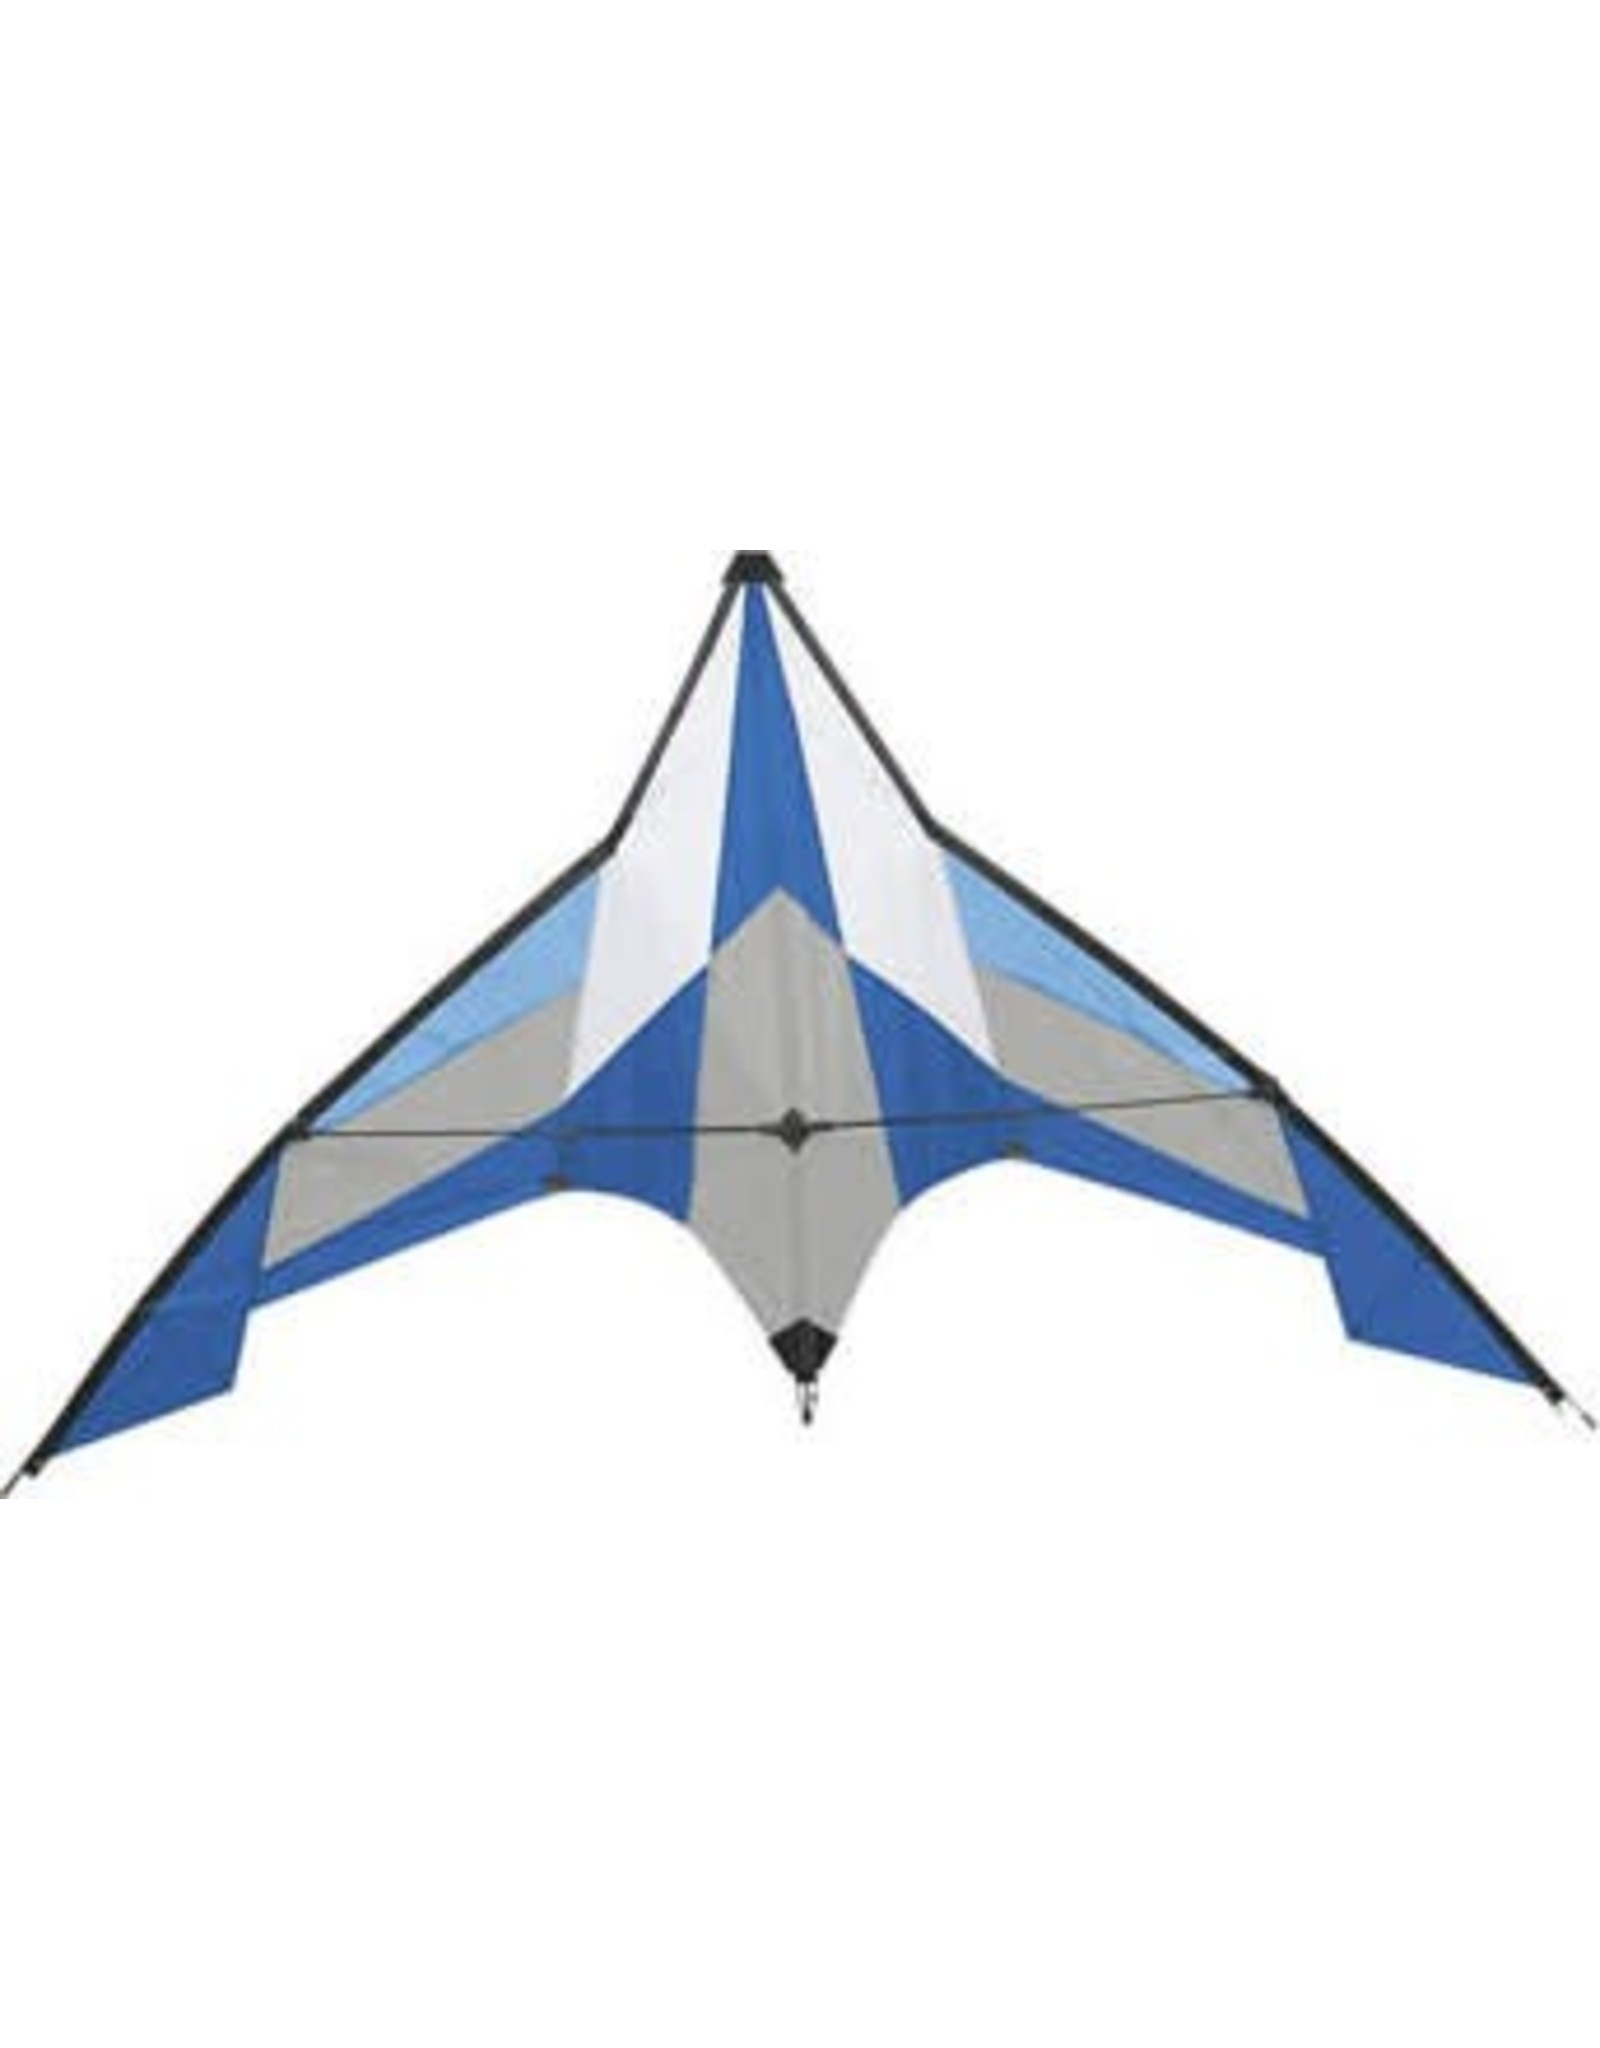 Gayla 1316 Stunt Master Air Force Dual Control 78x38